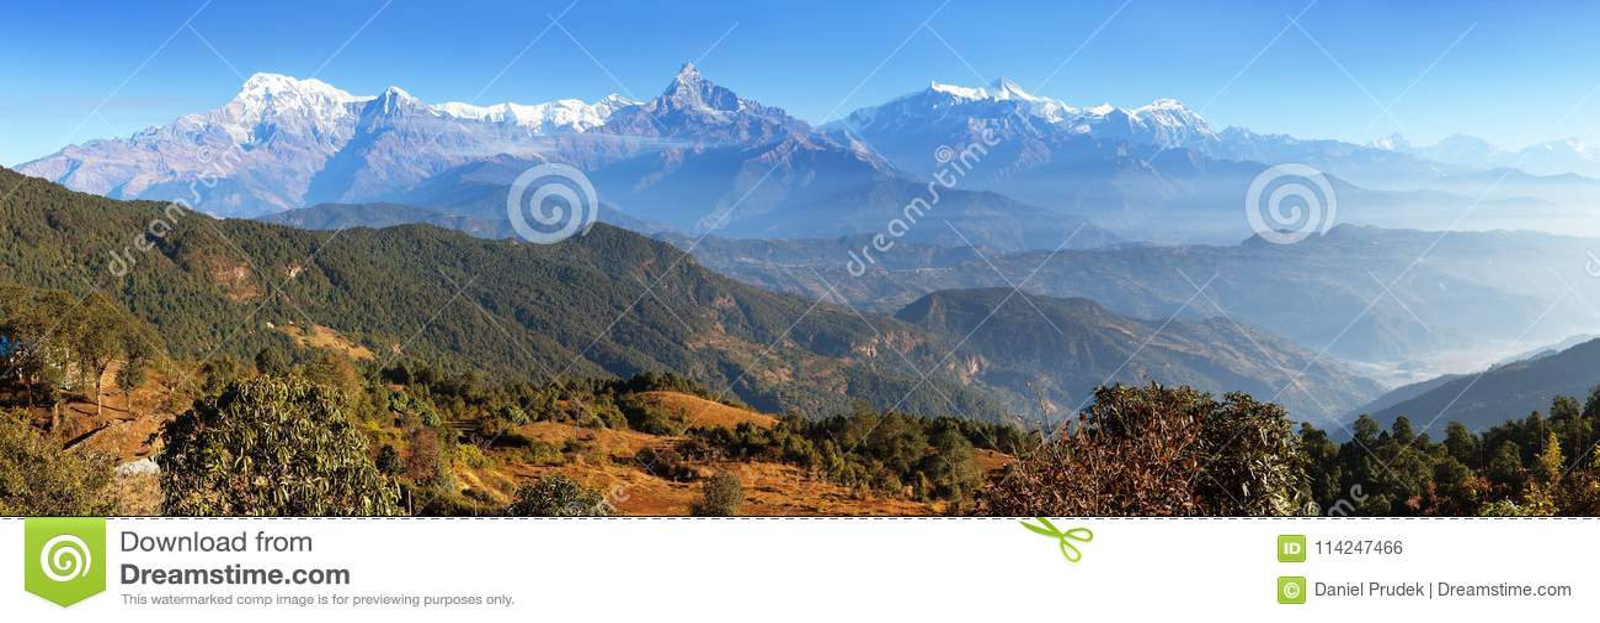 Panorama of mount Annapurna range, Nepal Himalayas